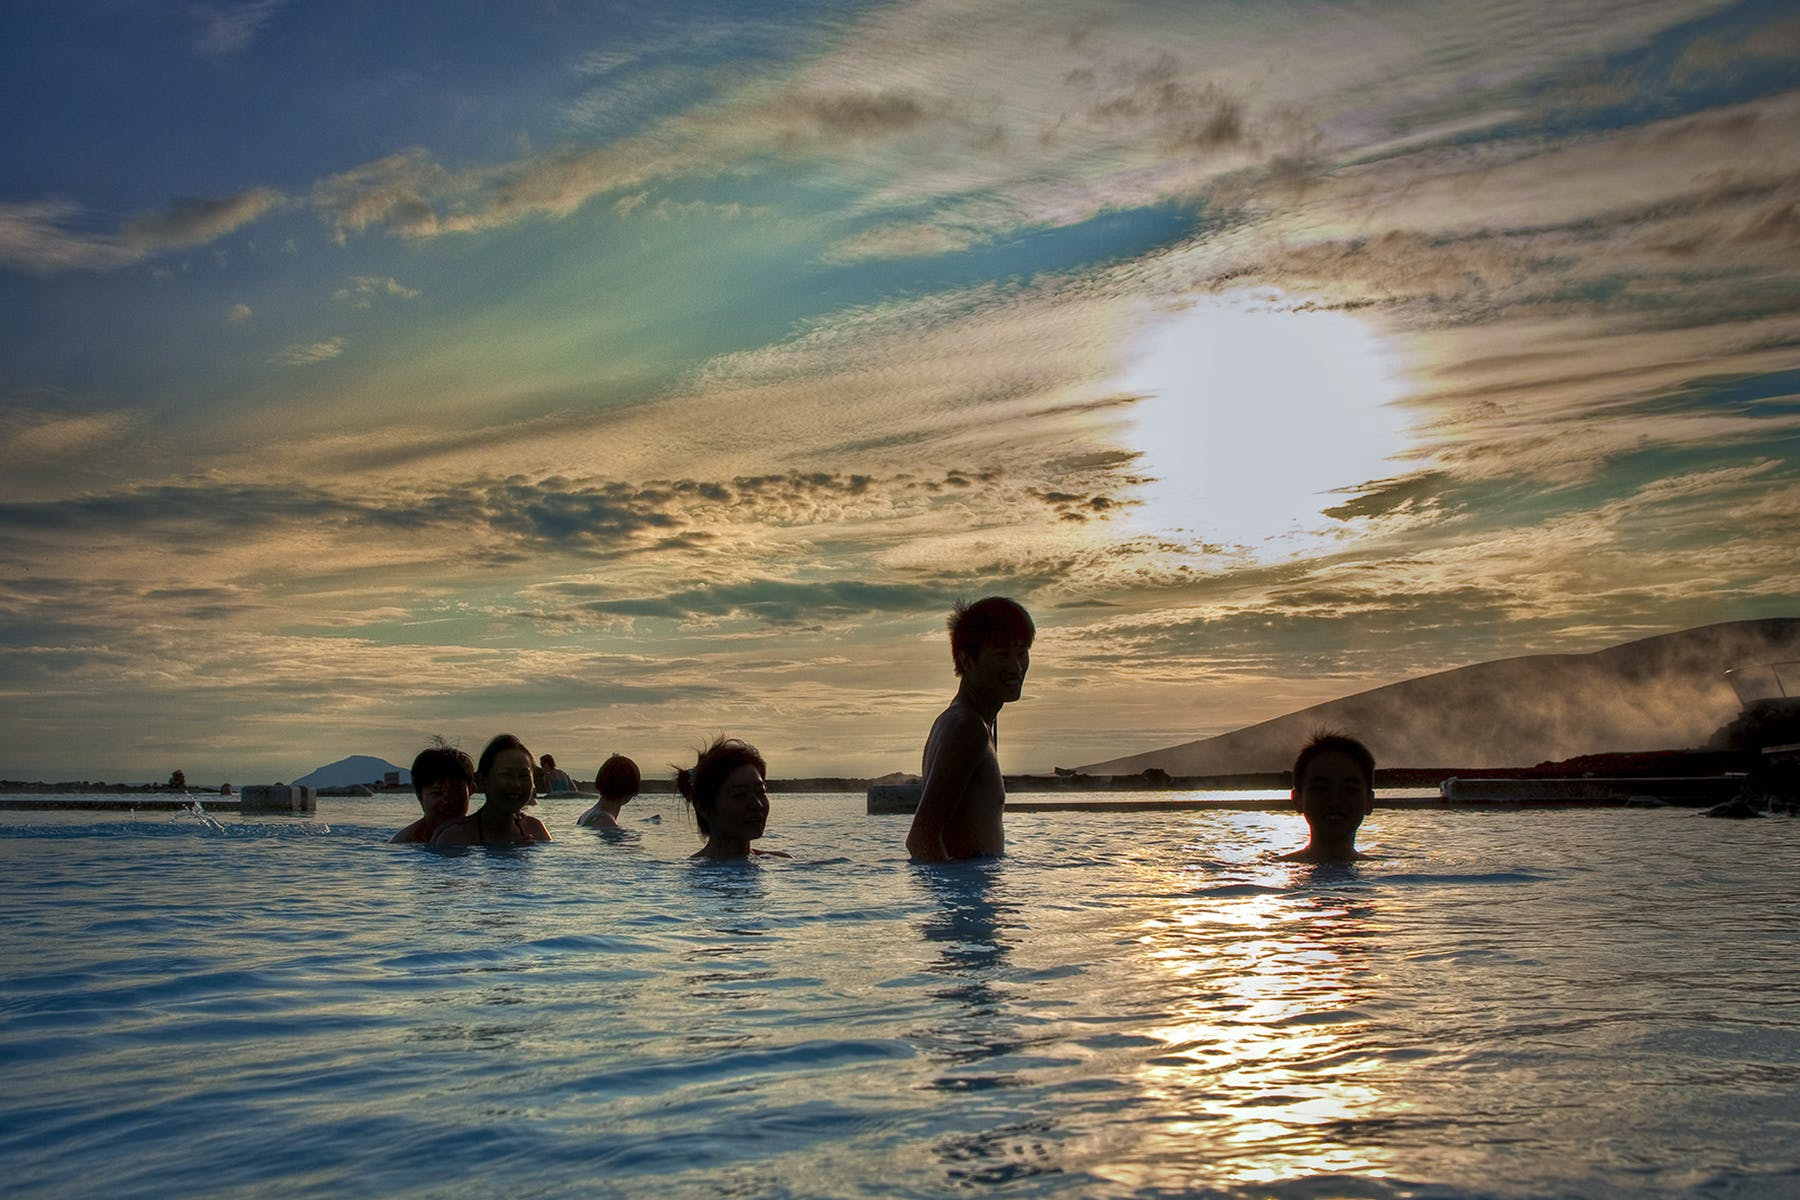 From Akureyri: All in one: Mývatn, Goðafoss, Dettifoss, Selfoss, Grjótagjá cave and the Nature baths